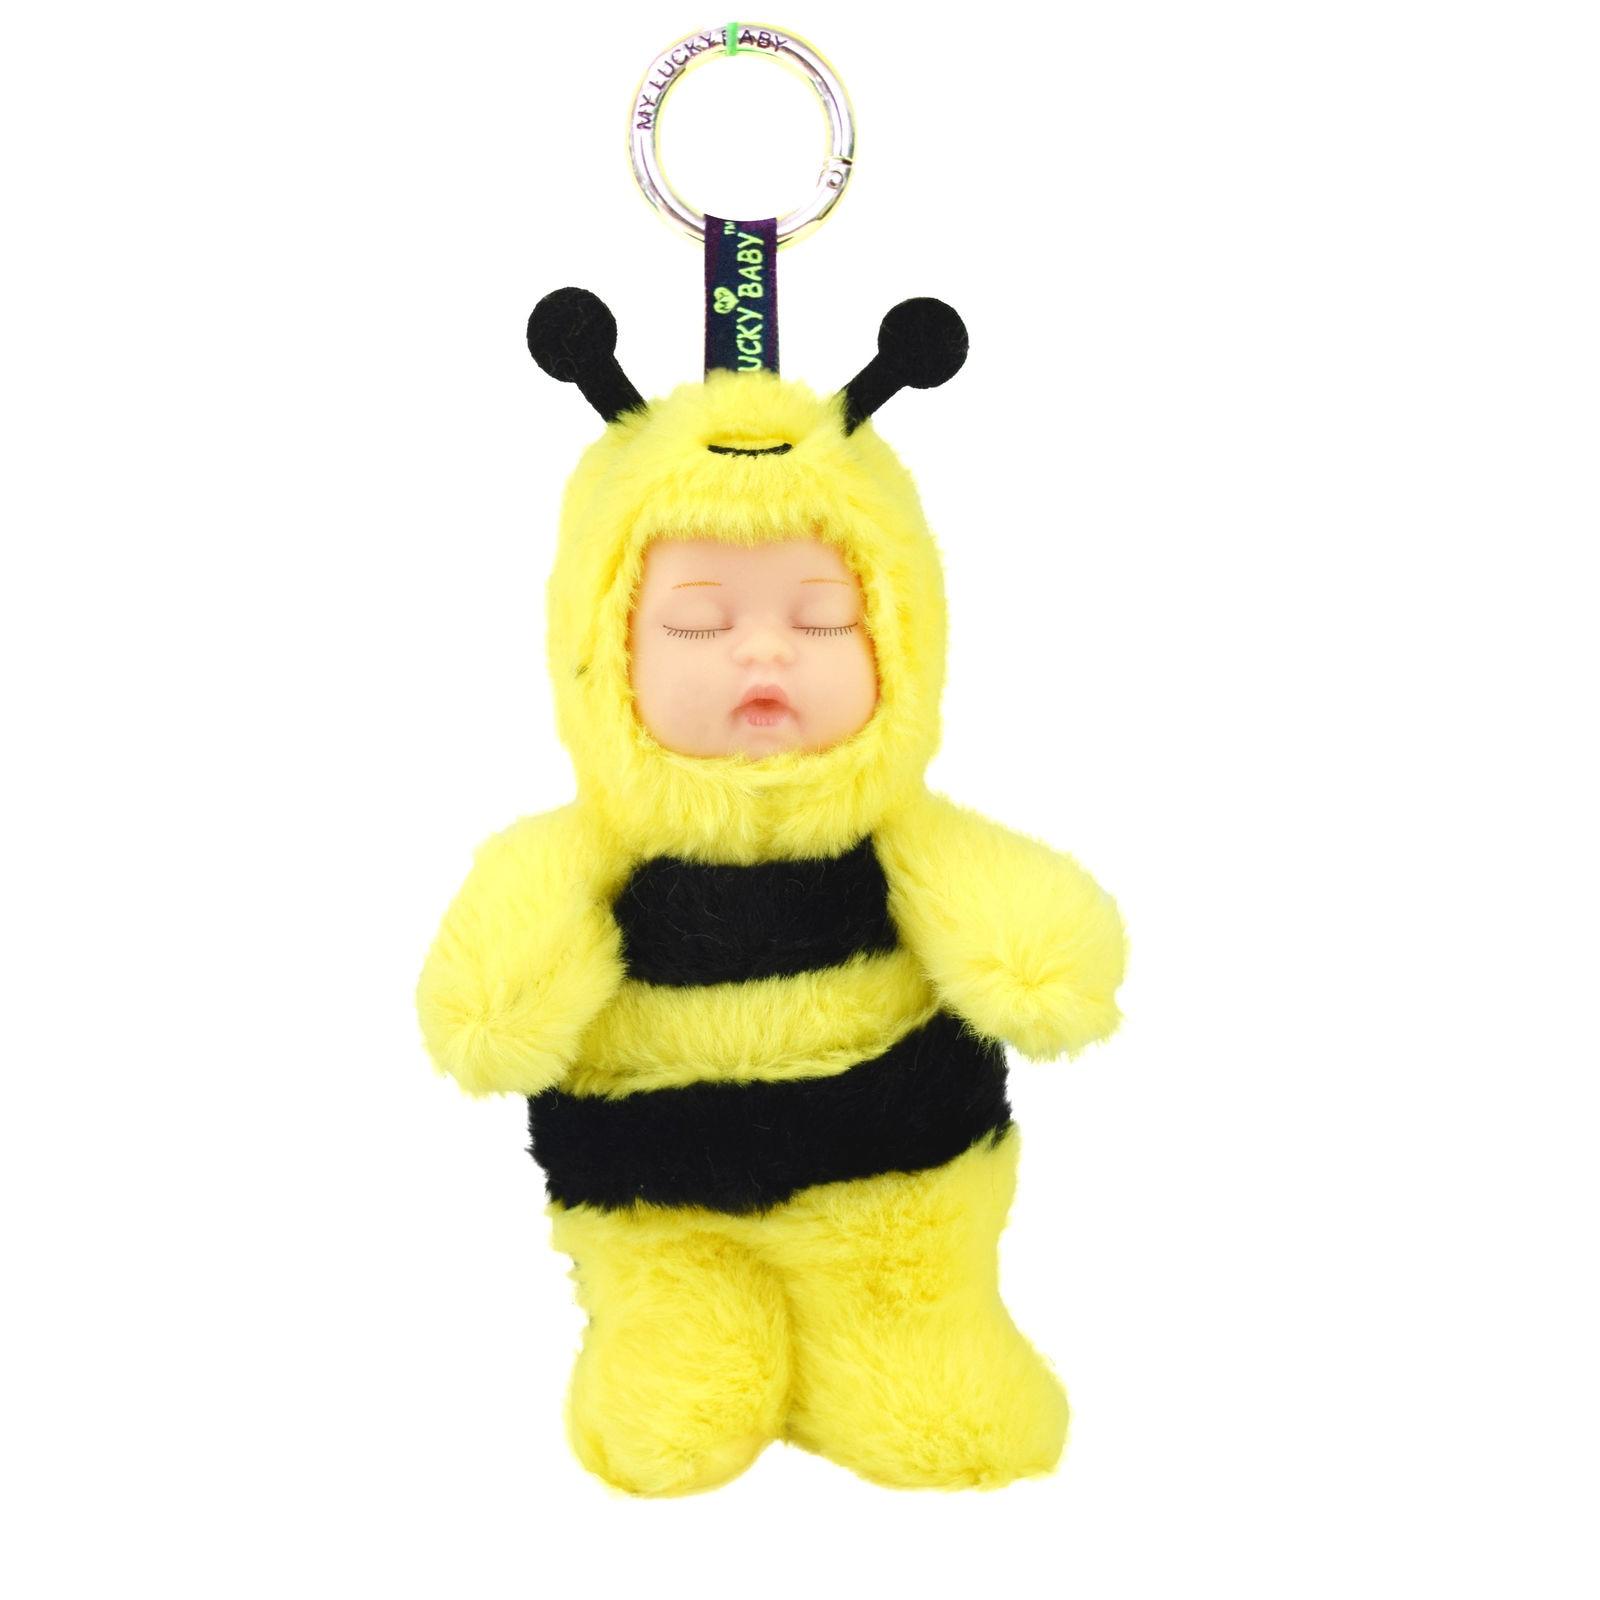 bee ! Plush Sleeping baby Dolls New Born Sleep Reborn Children Newborn Lovely Stuffed Cute Family Toy for Kid Baby Gift Toy 23cm